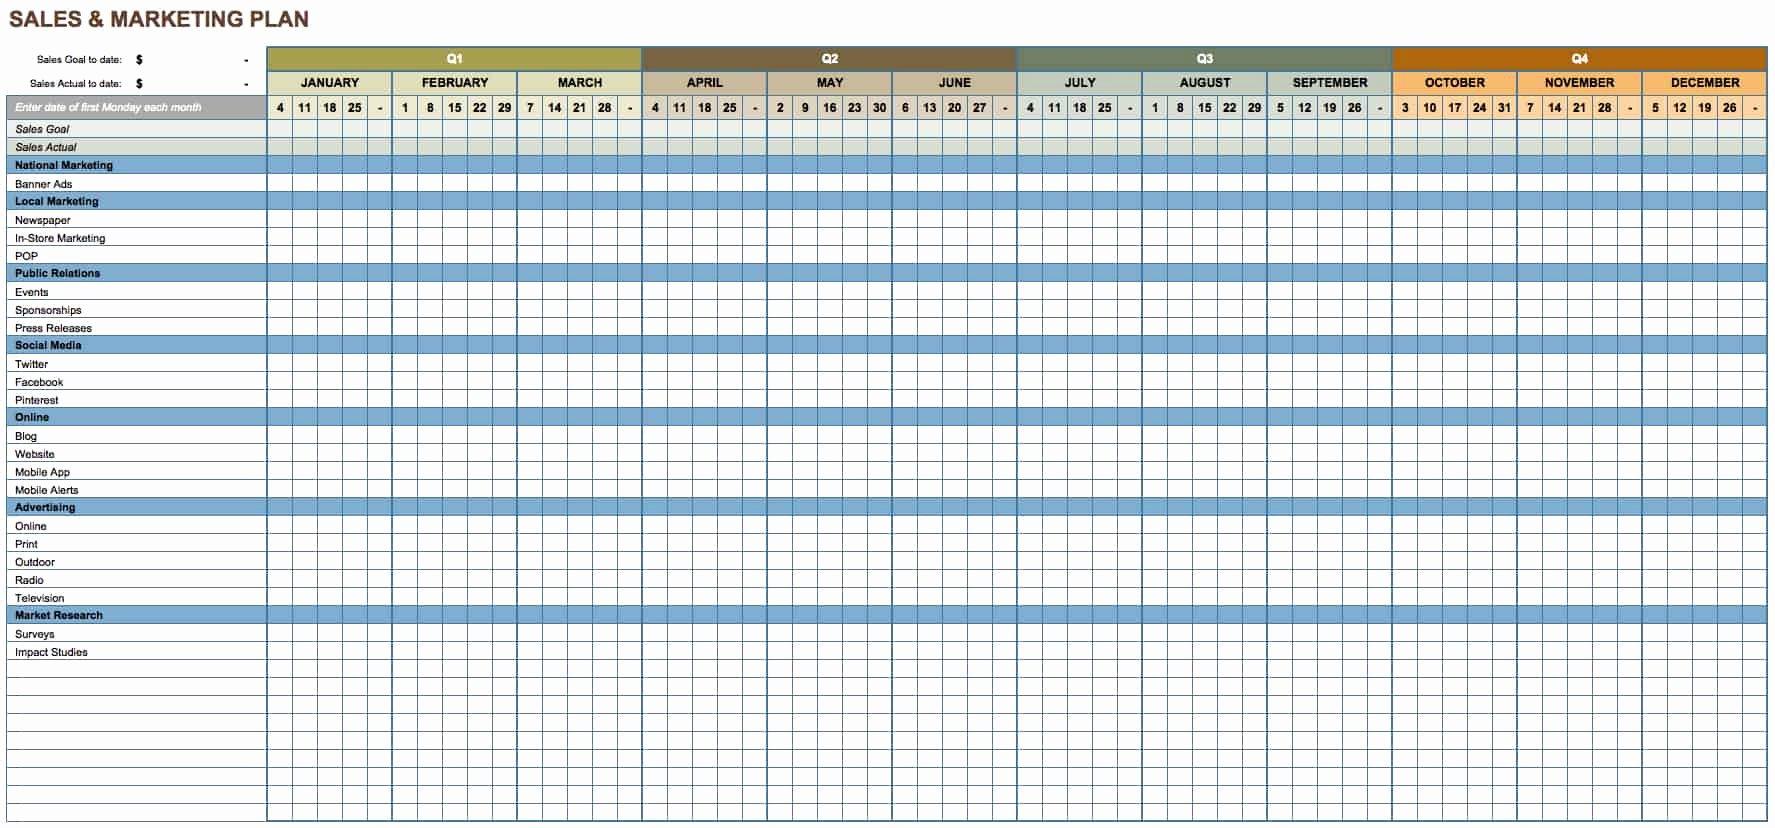 Marketing Timeline Template Excel New Free Marketing Plan Templates for Excel Smartsheet